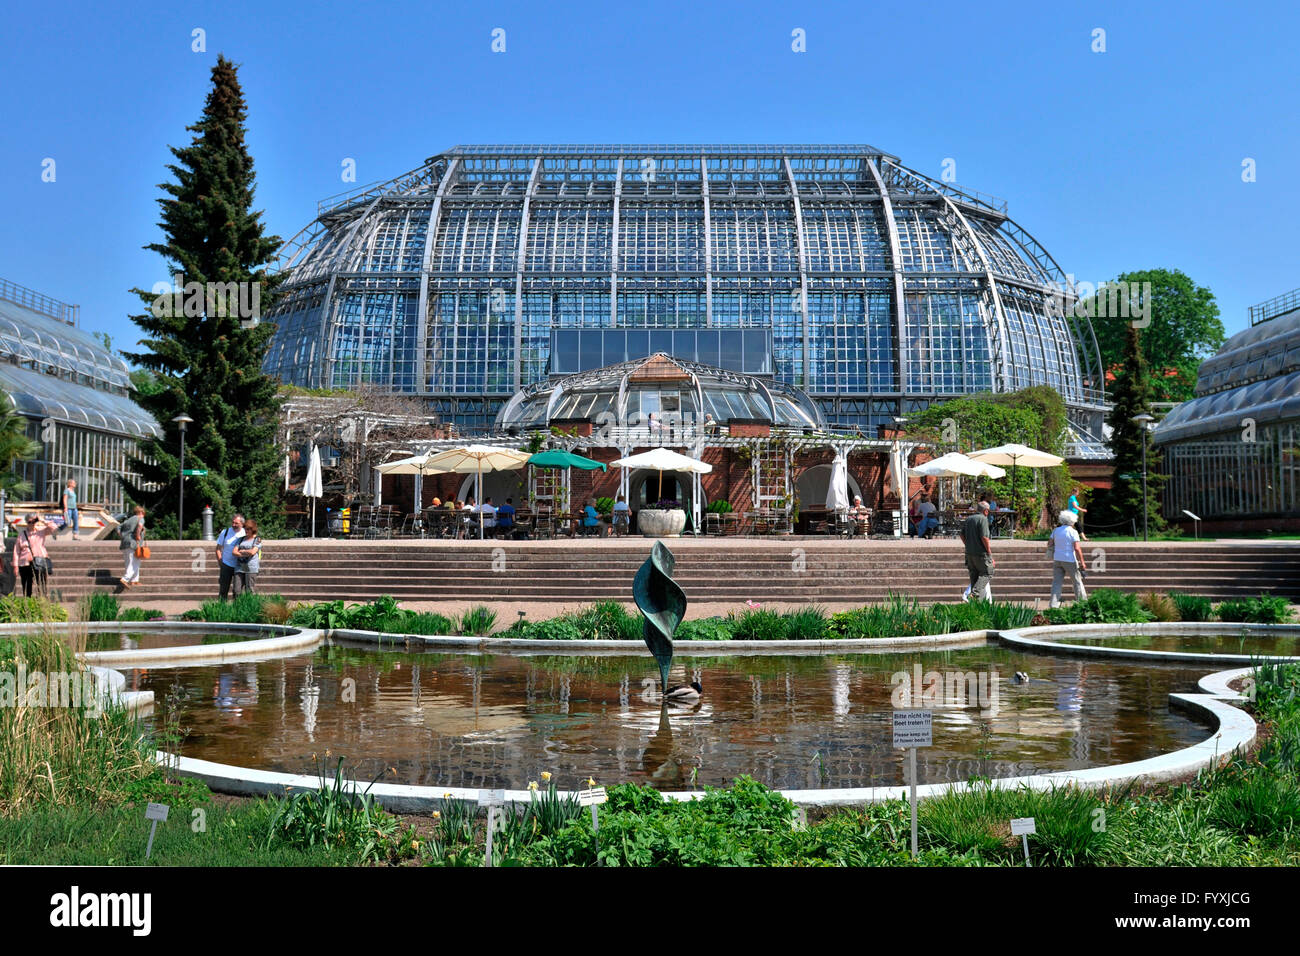 Charmant Great Greenhouse, Grosses Tropenhaus, Botanical Garden, Dahlem, Berlin,  Germany